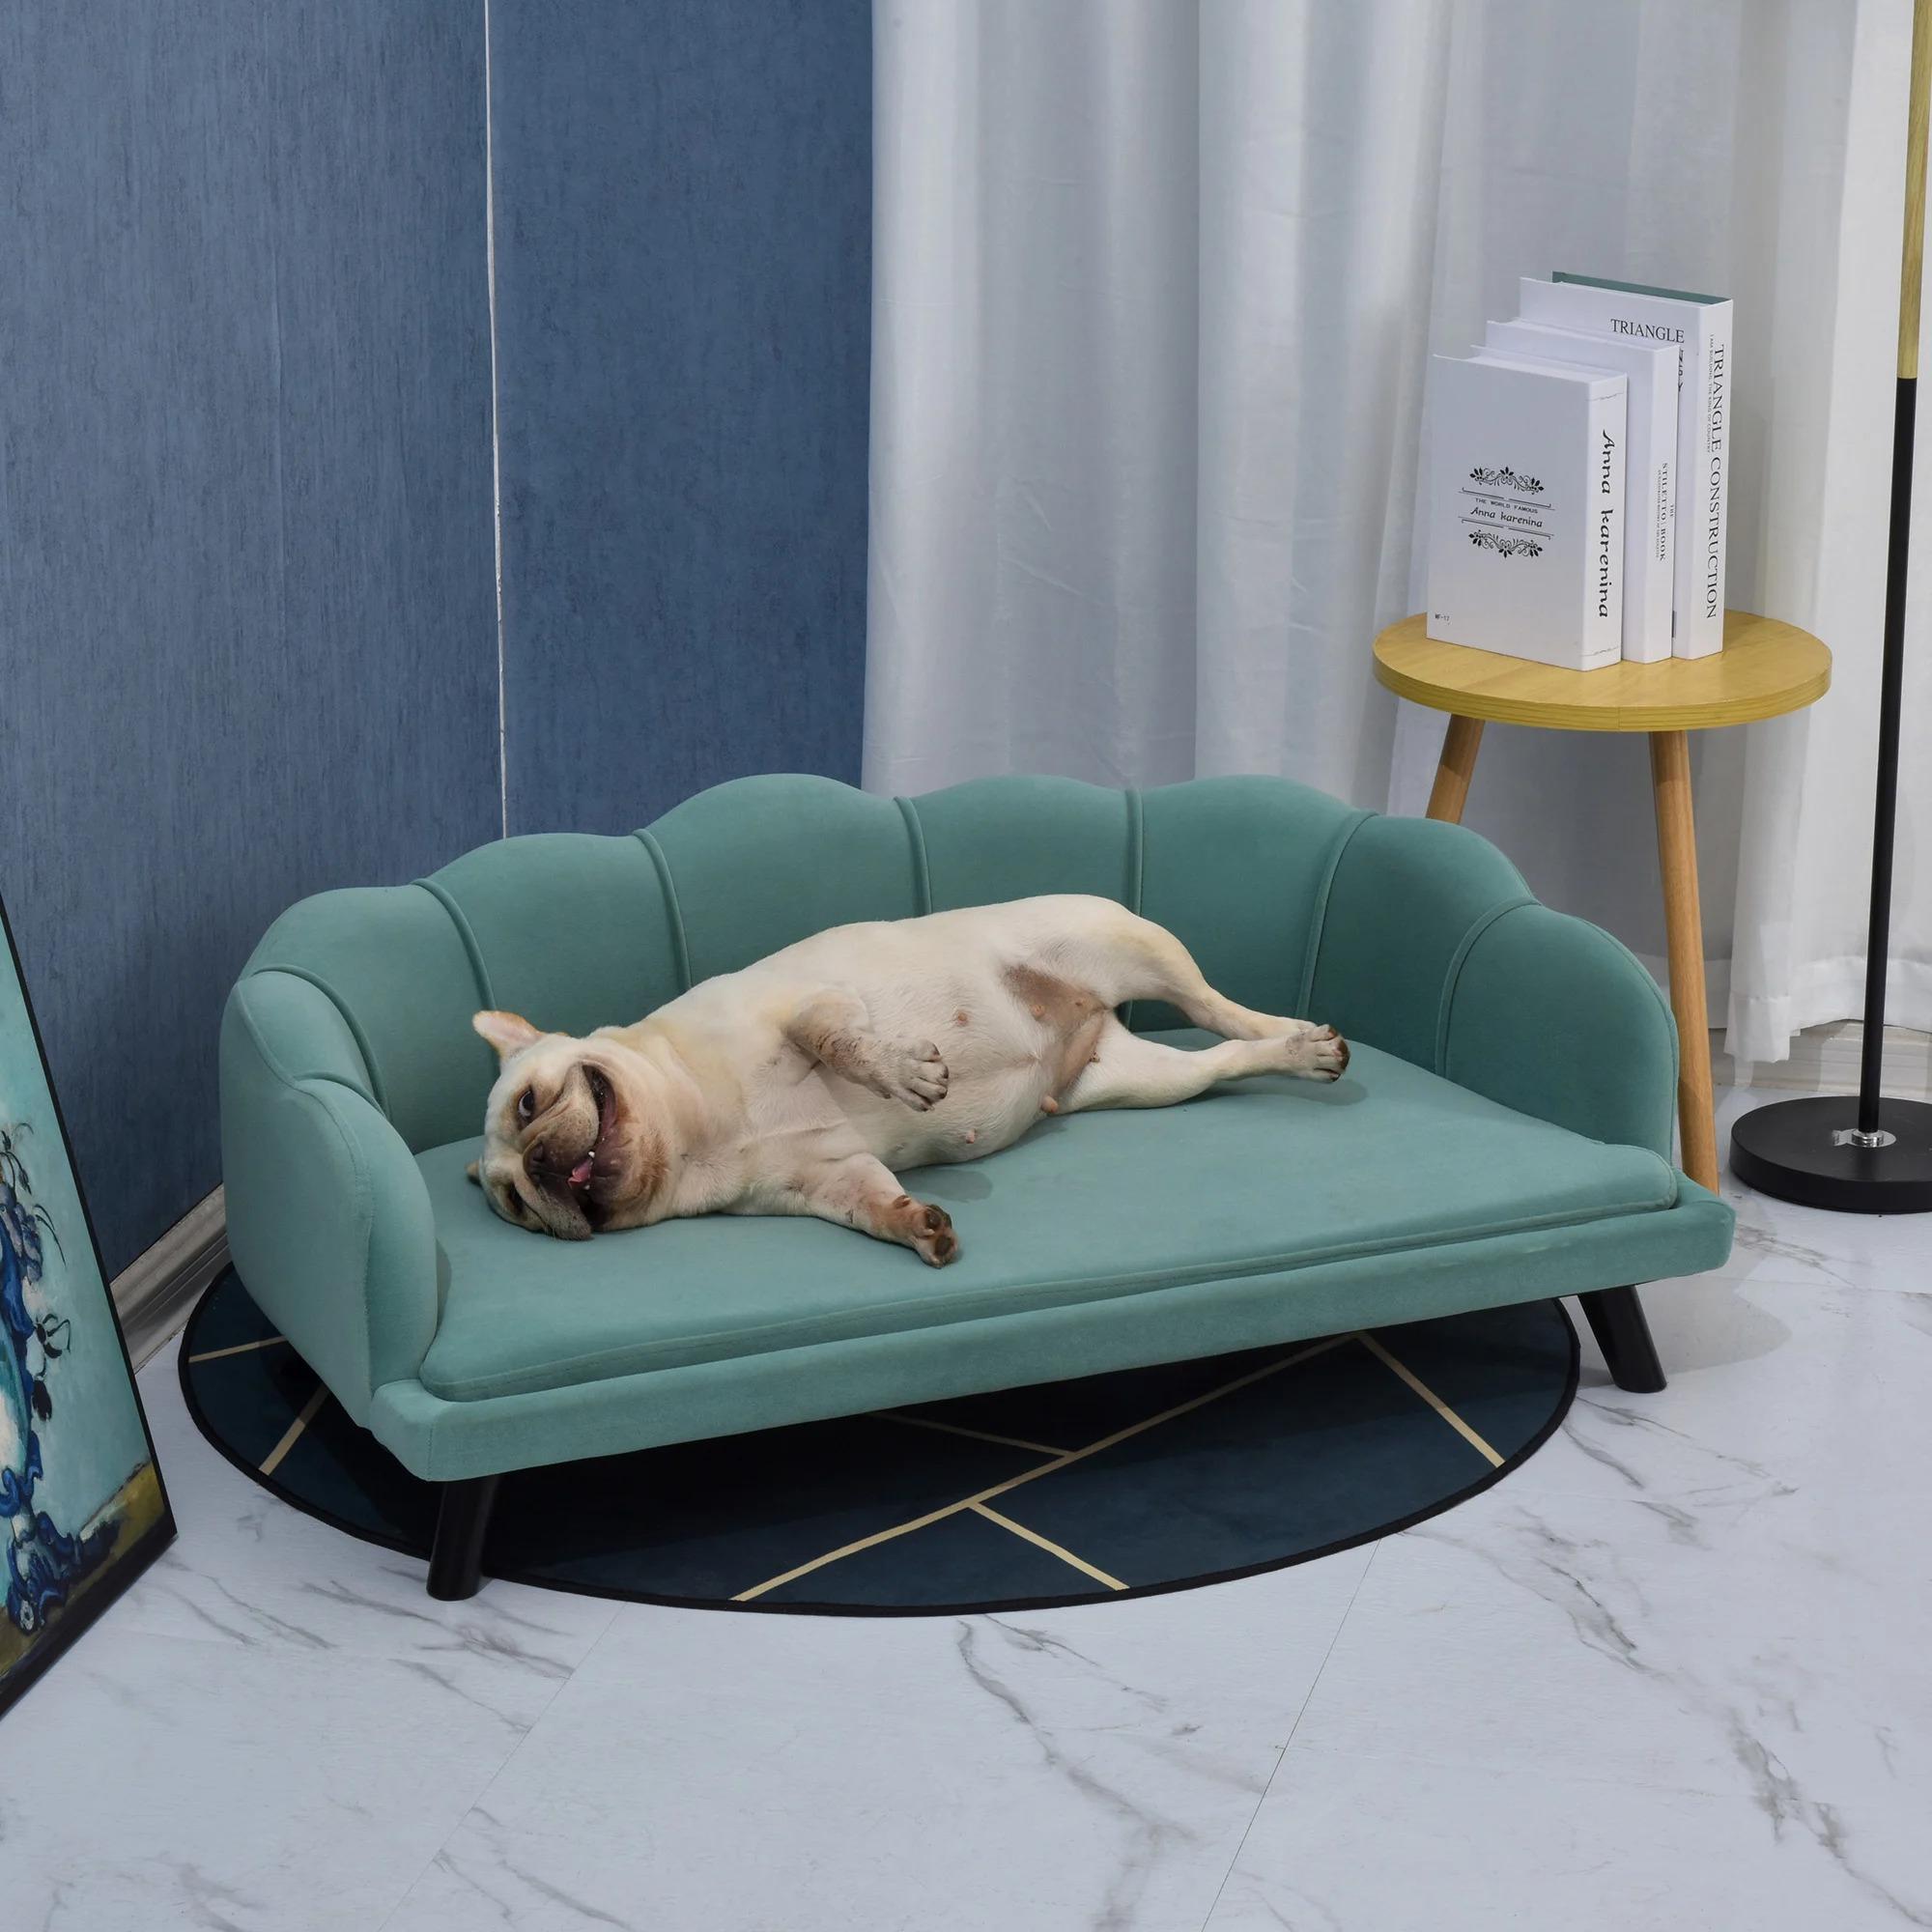 Hundesofa mit weichem Bezug Hundebett grün